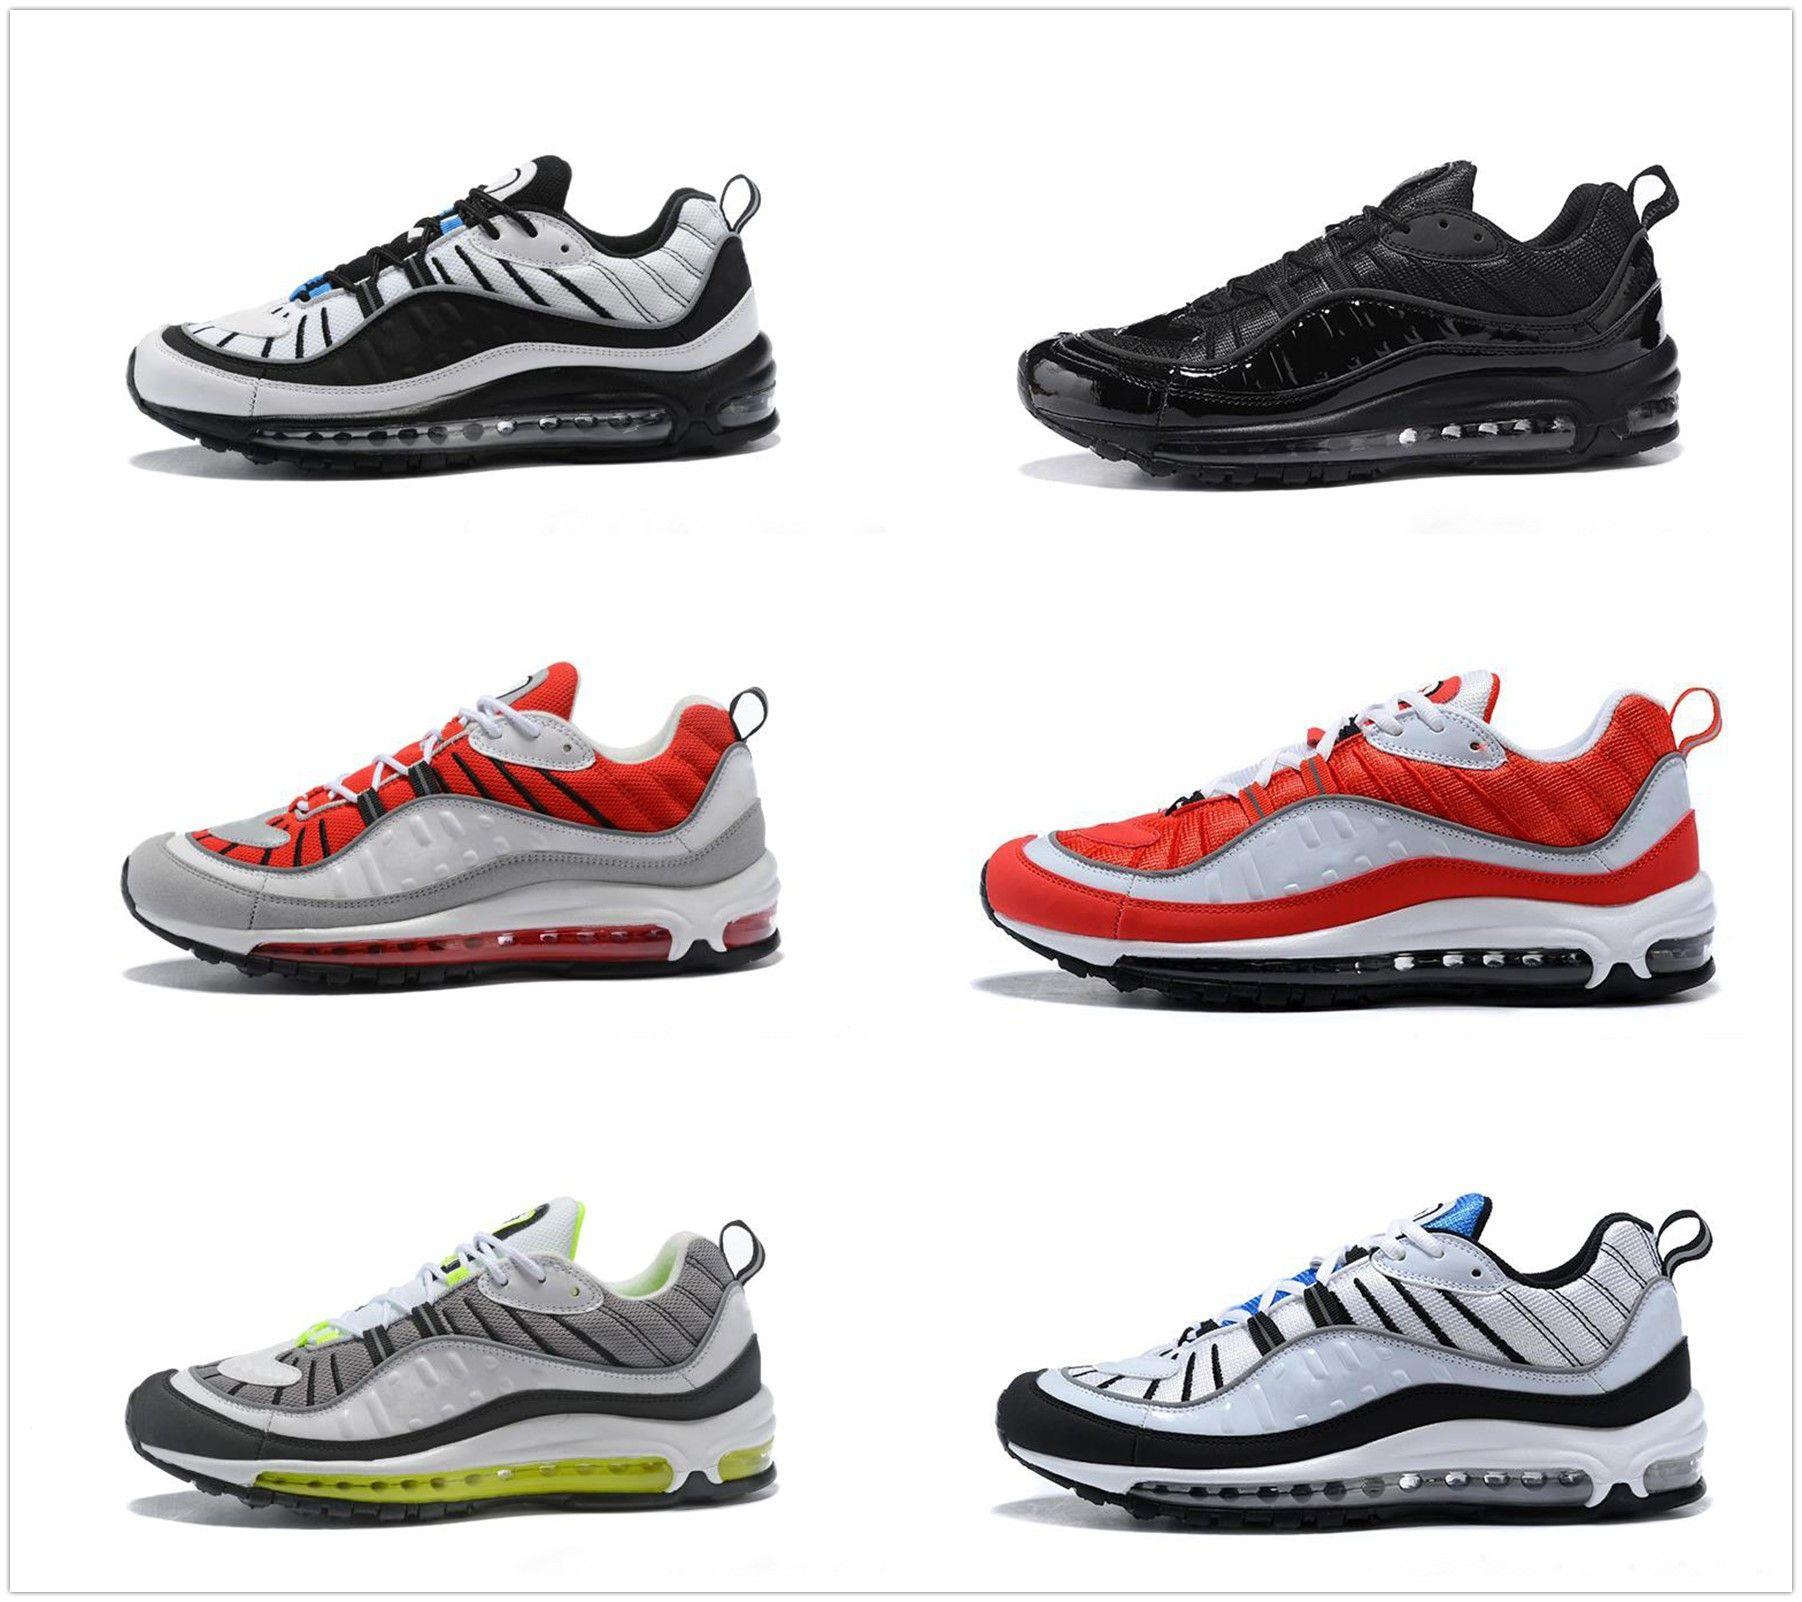 new style 1efa3 b6e72 Acquista Nike Air Max 98 Airmax New Top 98 98 Stripe Blu Navy Bianco Gundam  Style Best Quality Uomo Casual Scarpe Da Corsa Sport Discount Sneakers  Taglia 7 ...